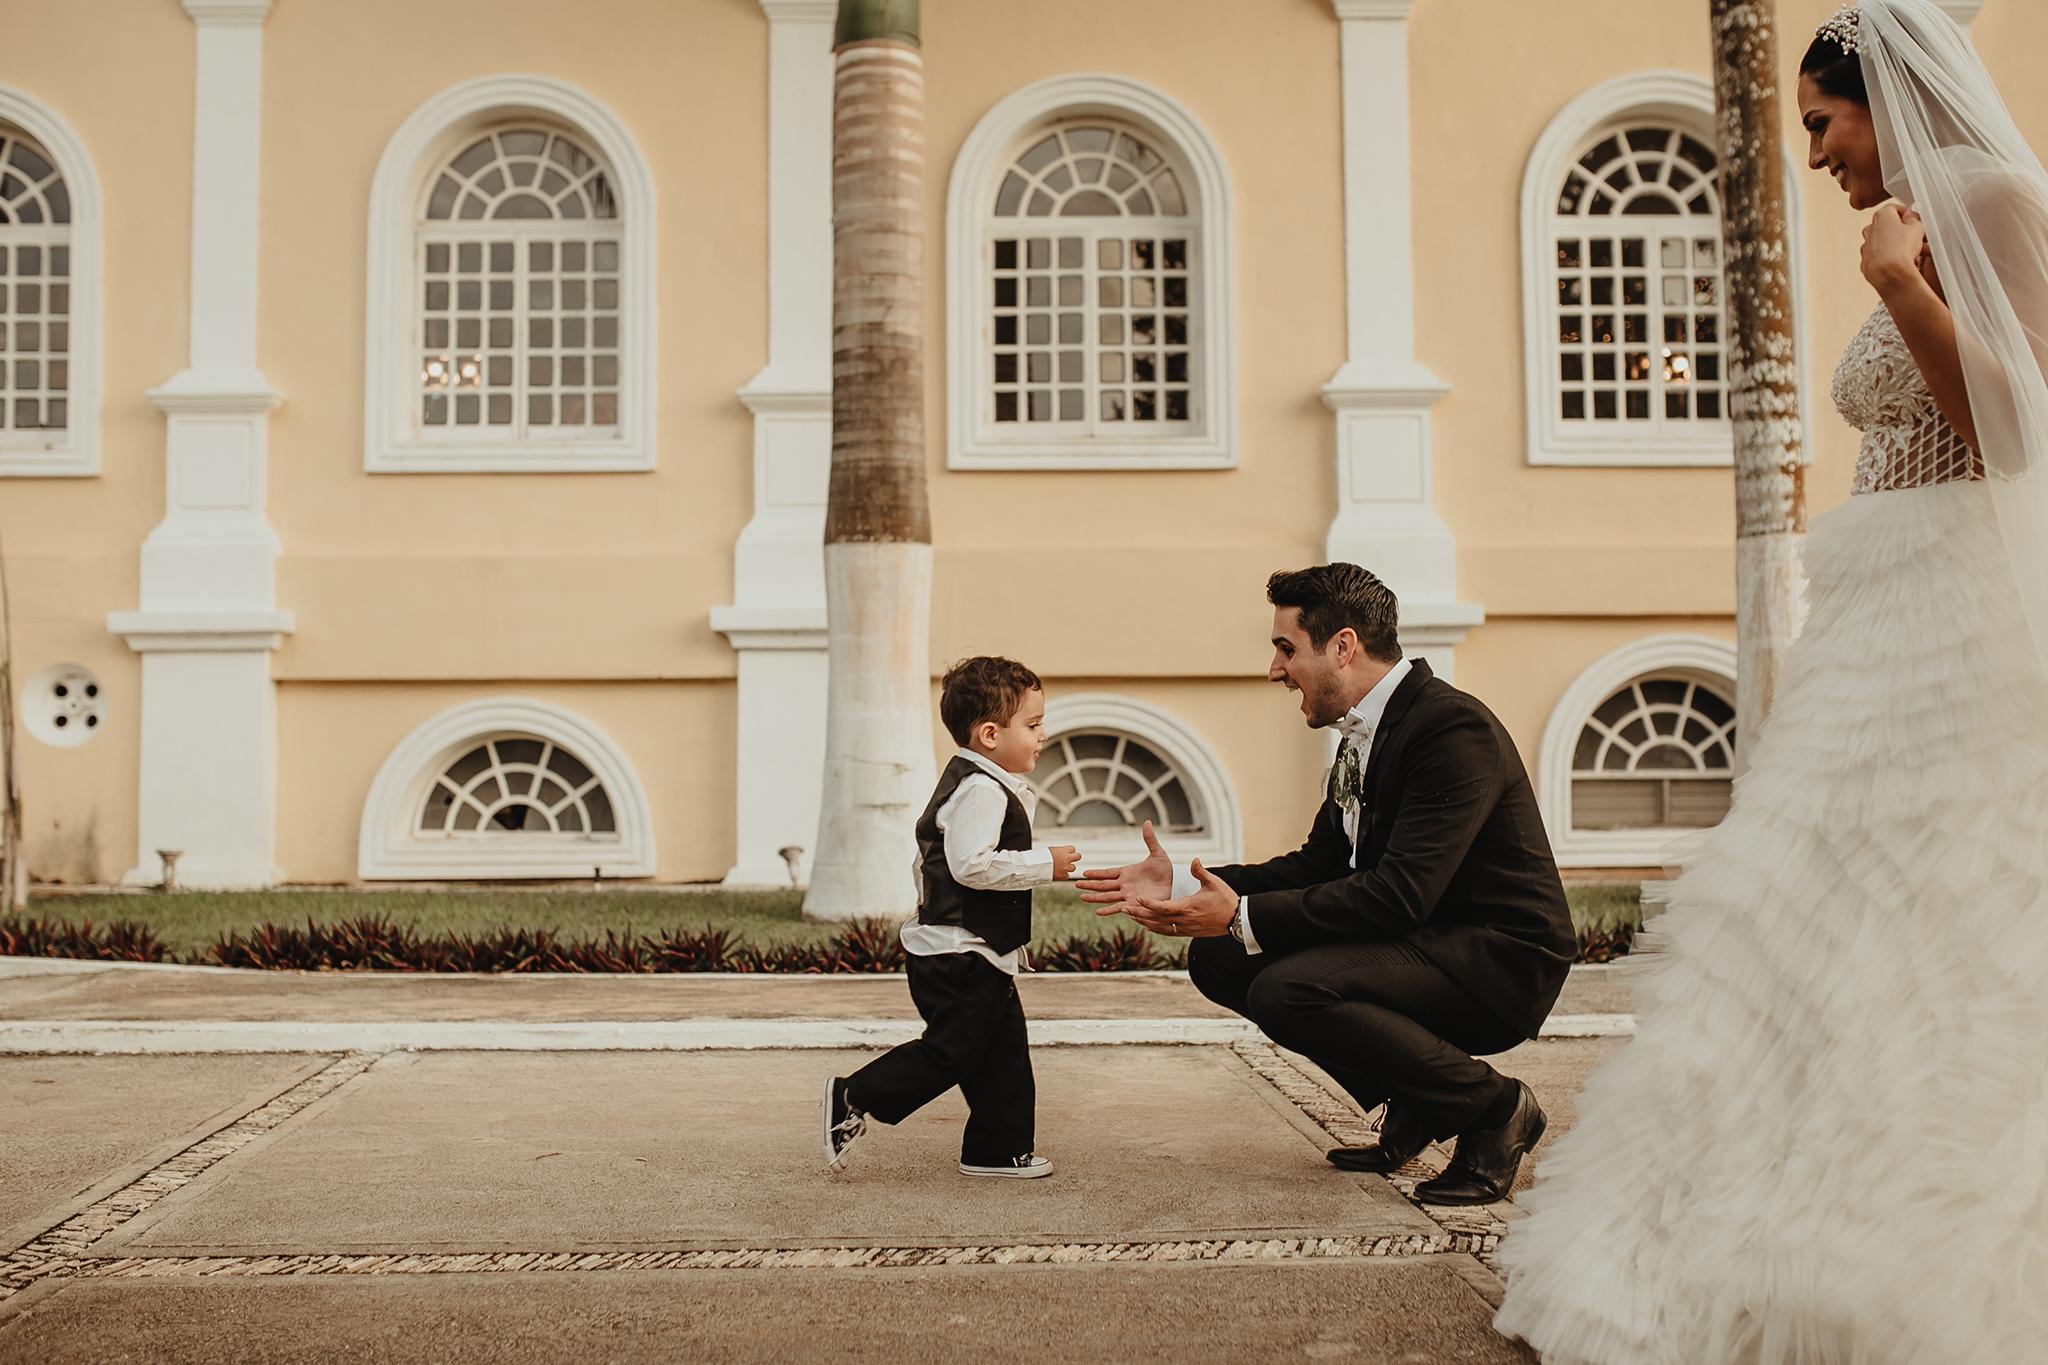 0849R&F__WeddingDestination_Weddingmerida_BodaMexico_FotografoDeBodas_FabrizioSimoneenFotografo.jpg